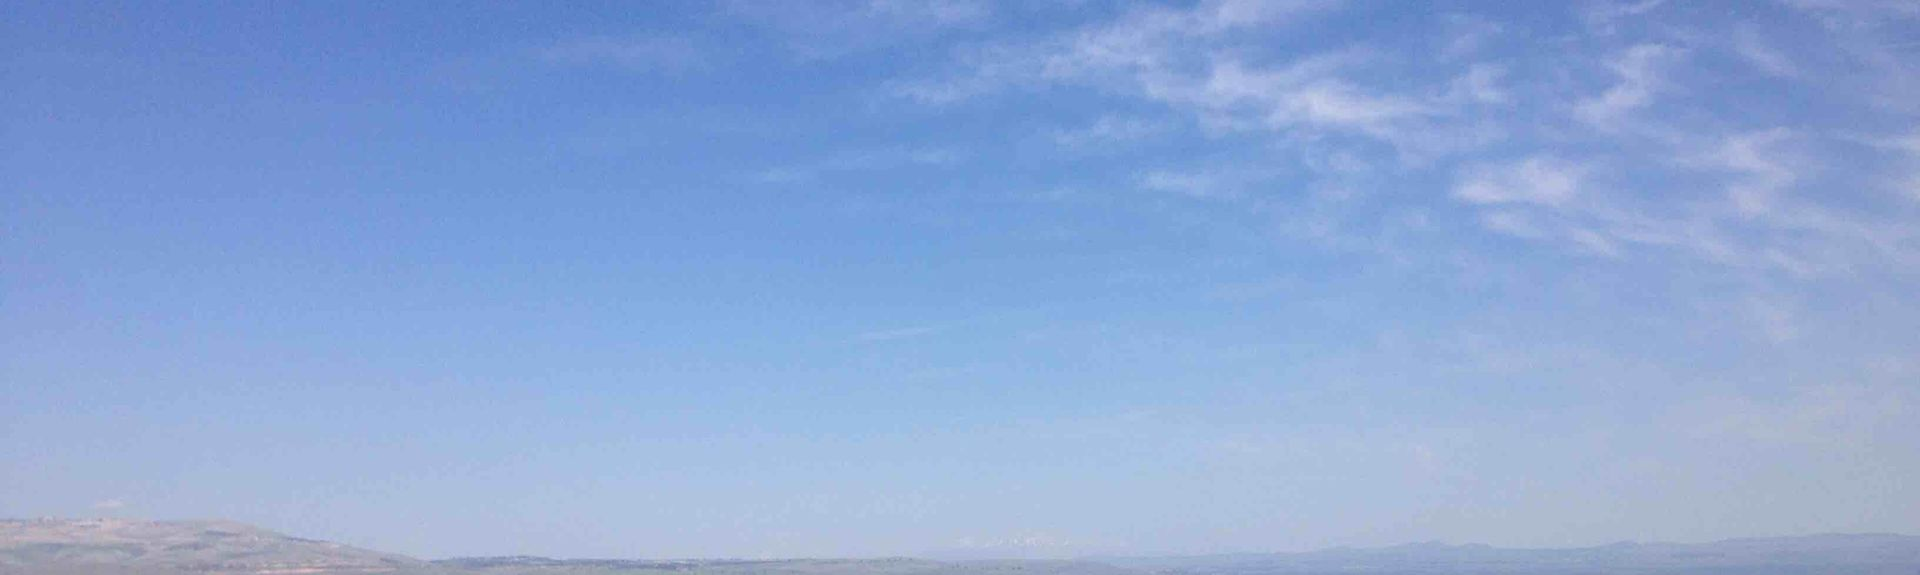 Sea of Galilee, Northern District, Israel